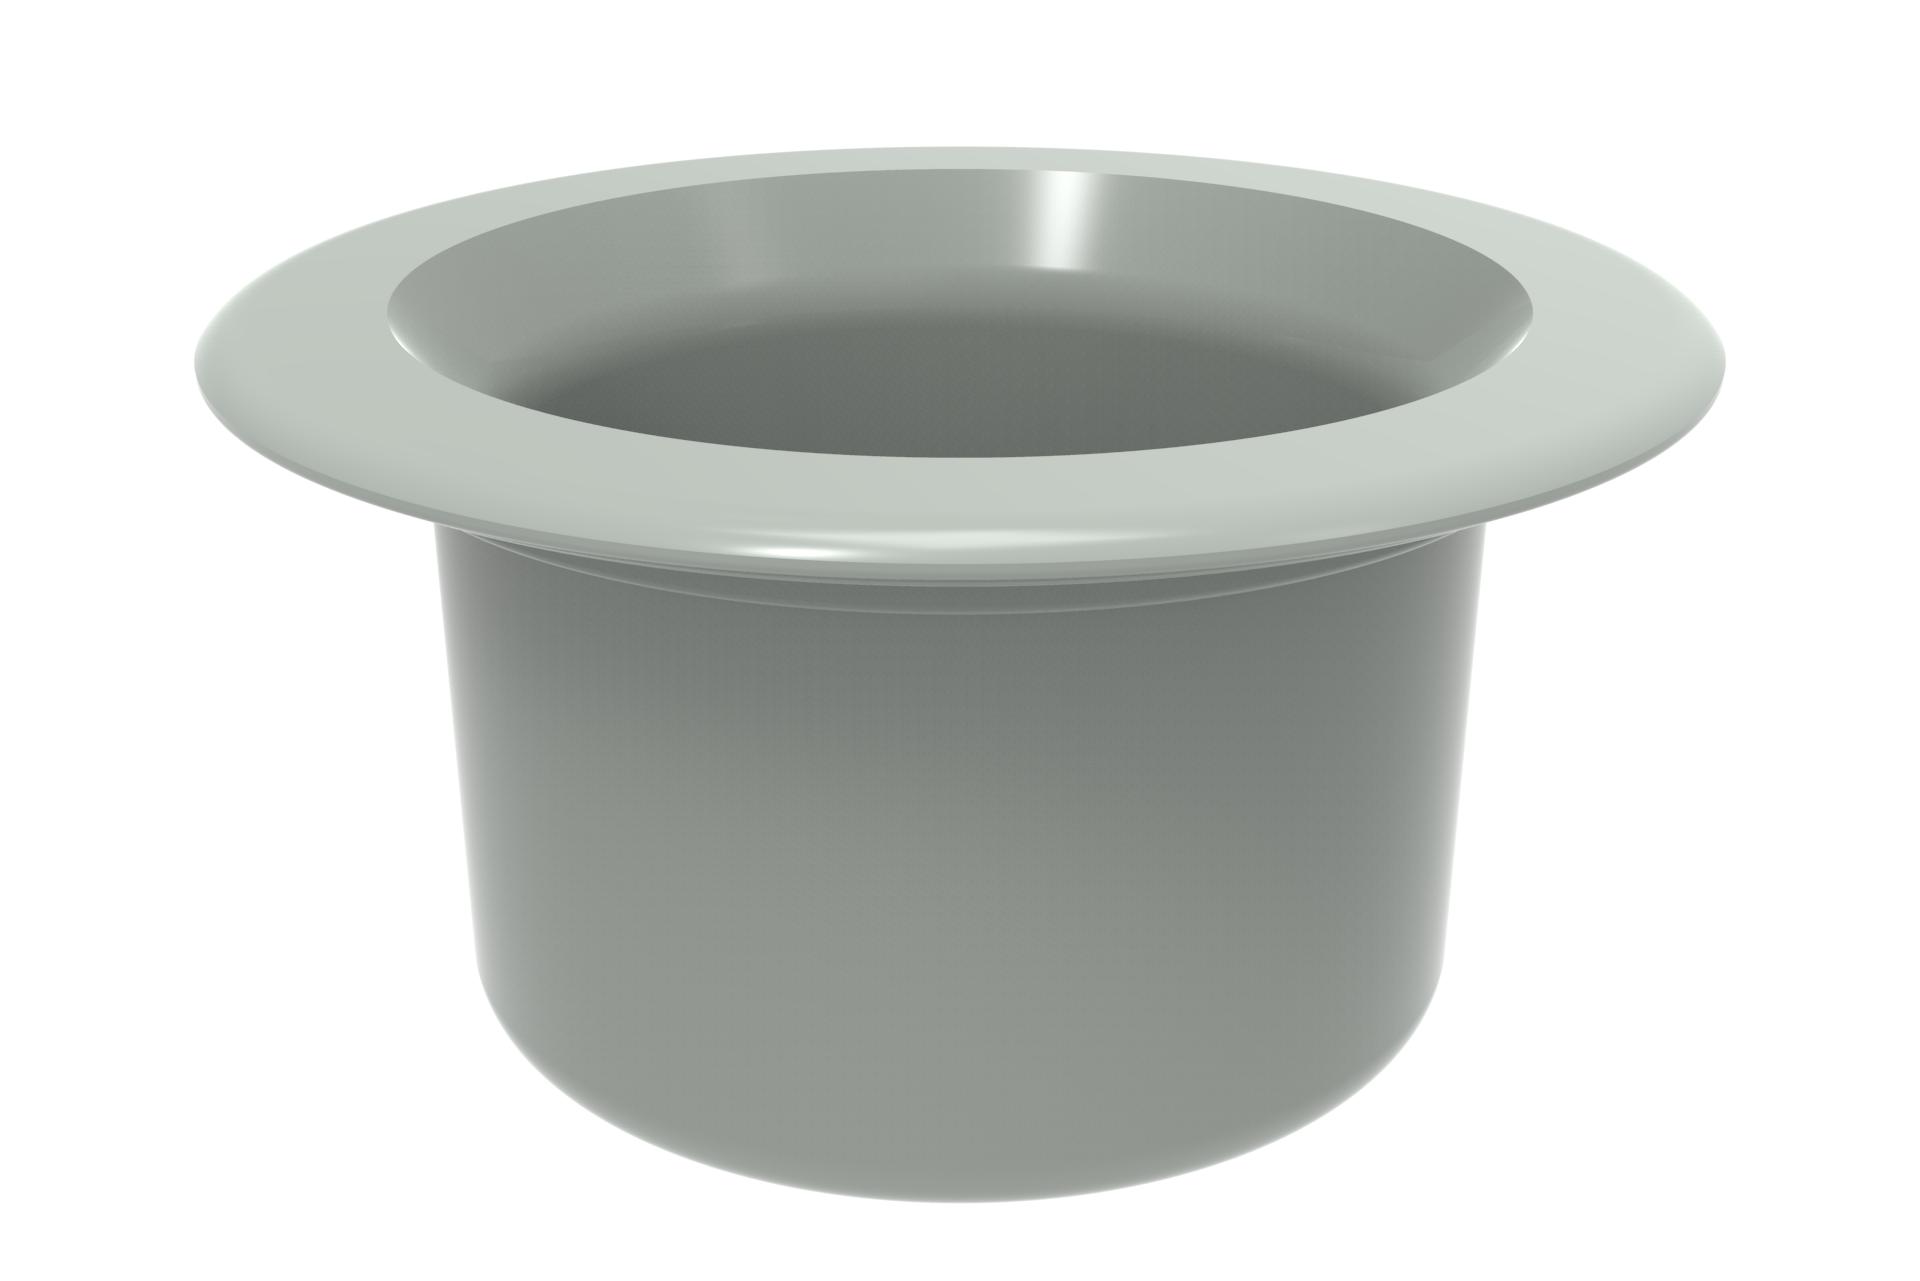 Retrofit Pebble Top Cap - comes empty ready to fill